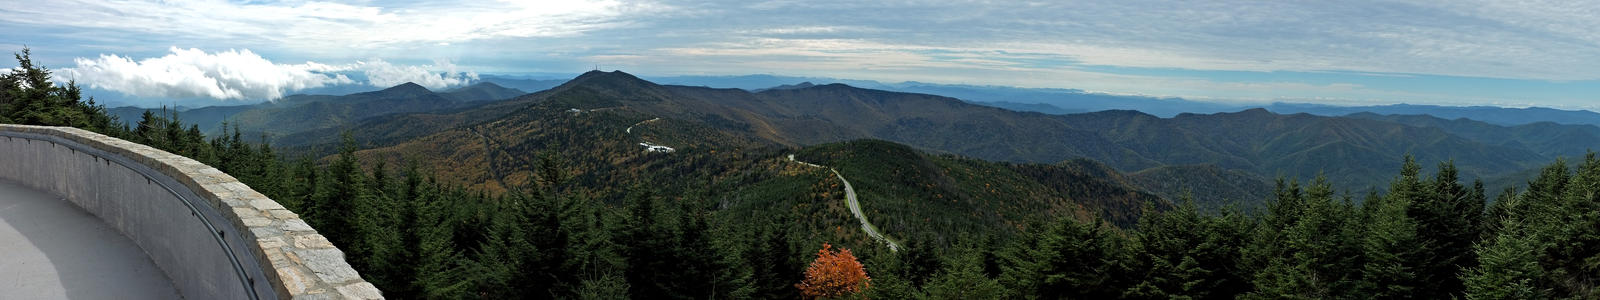 Mt. Mitchell Summit Panorama 2